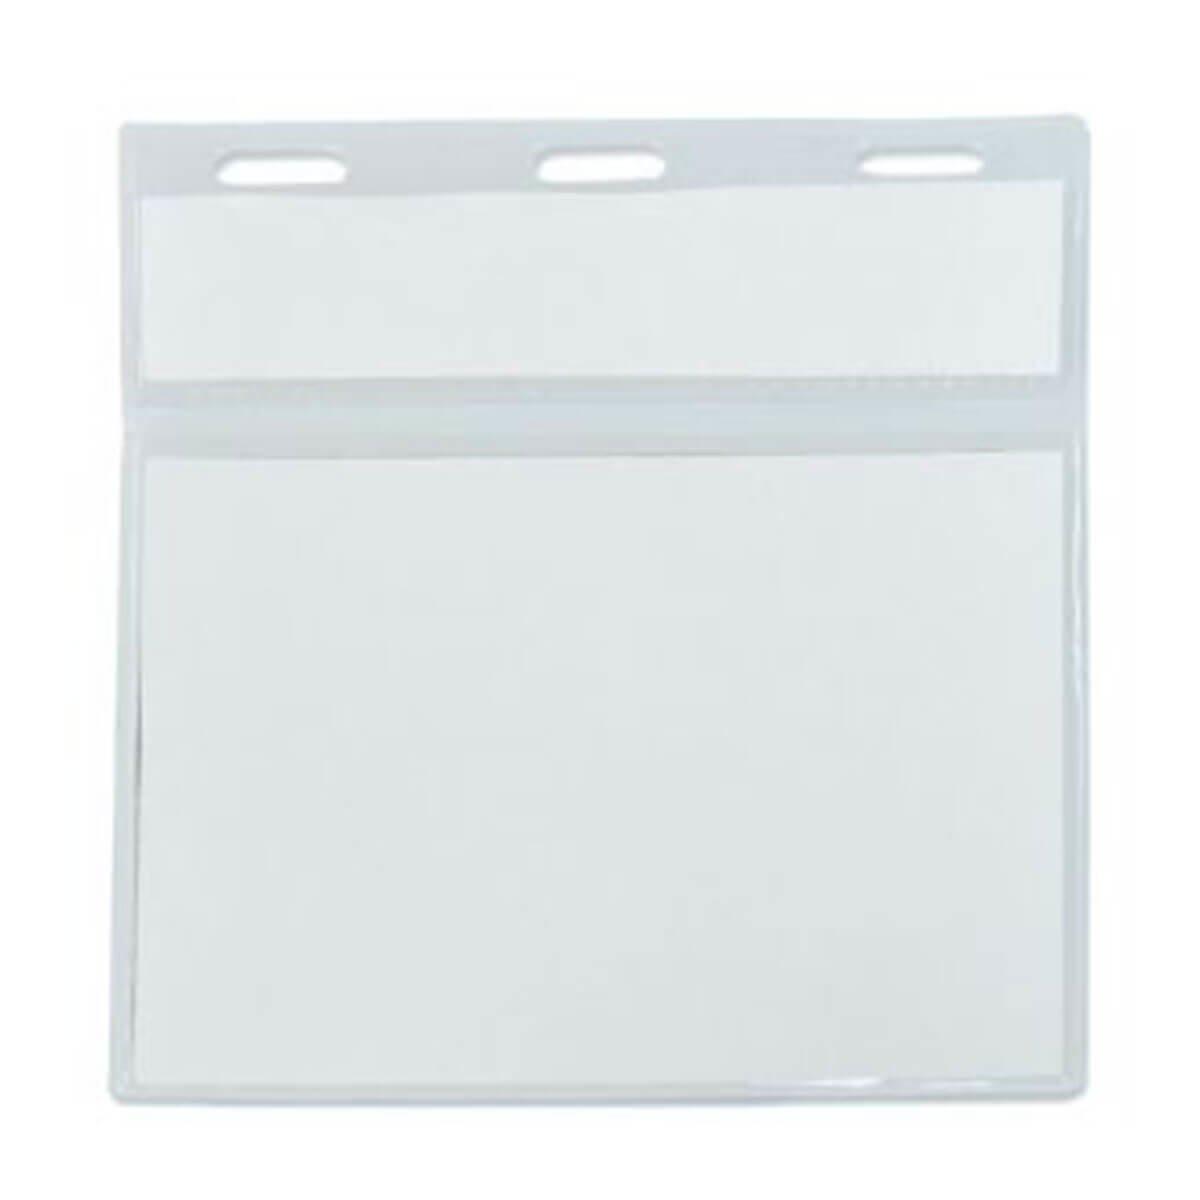 Double ID Pocket-Transparent.